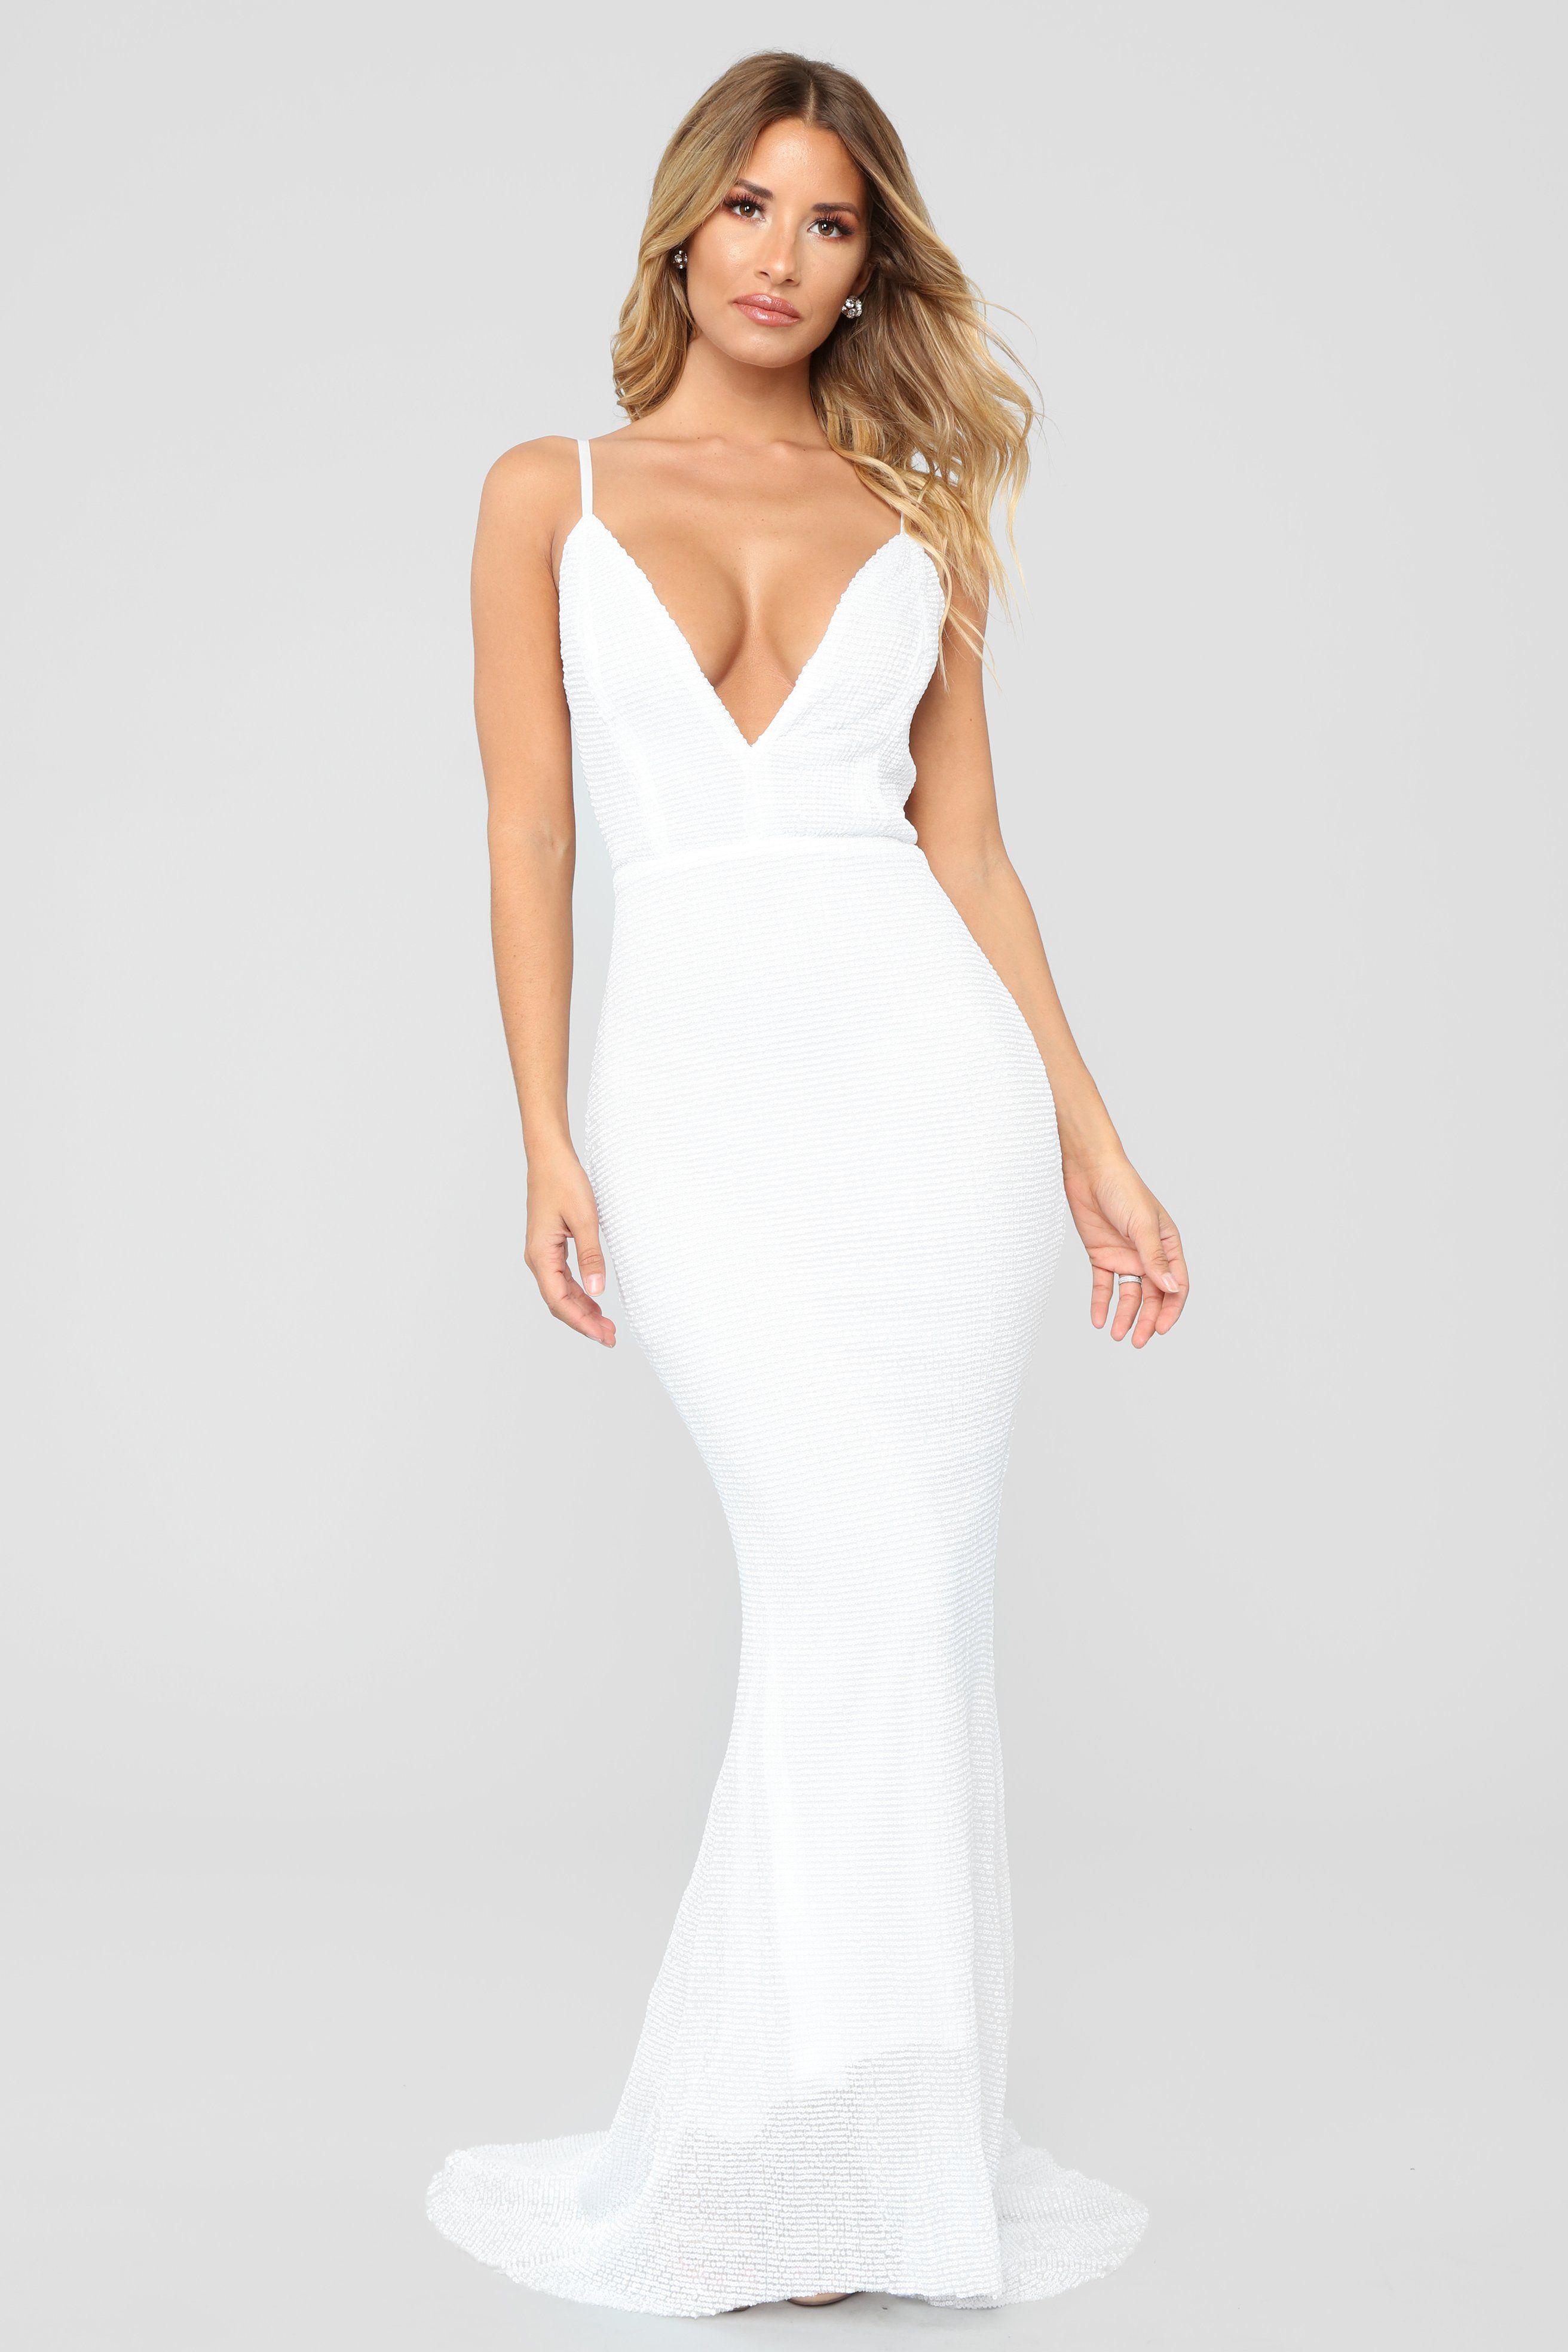 Sparkling Champagne Sequin Dress White Champagne Sequin Dress Dresses White Dress [ 3936 x 2624 Pixel ]